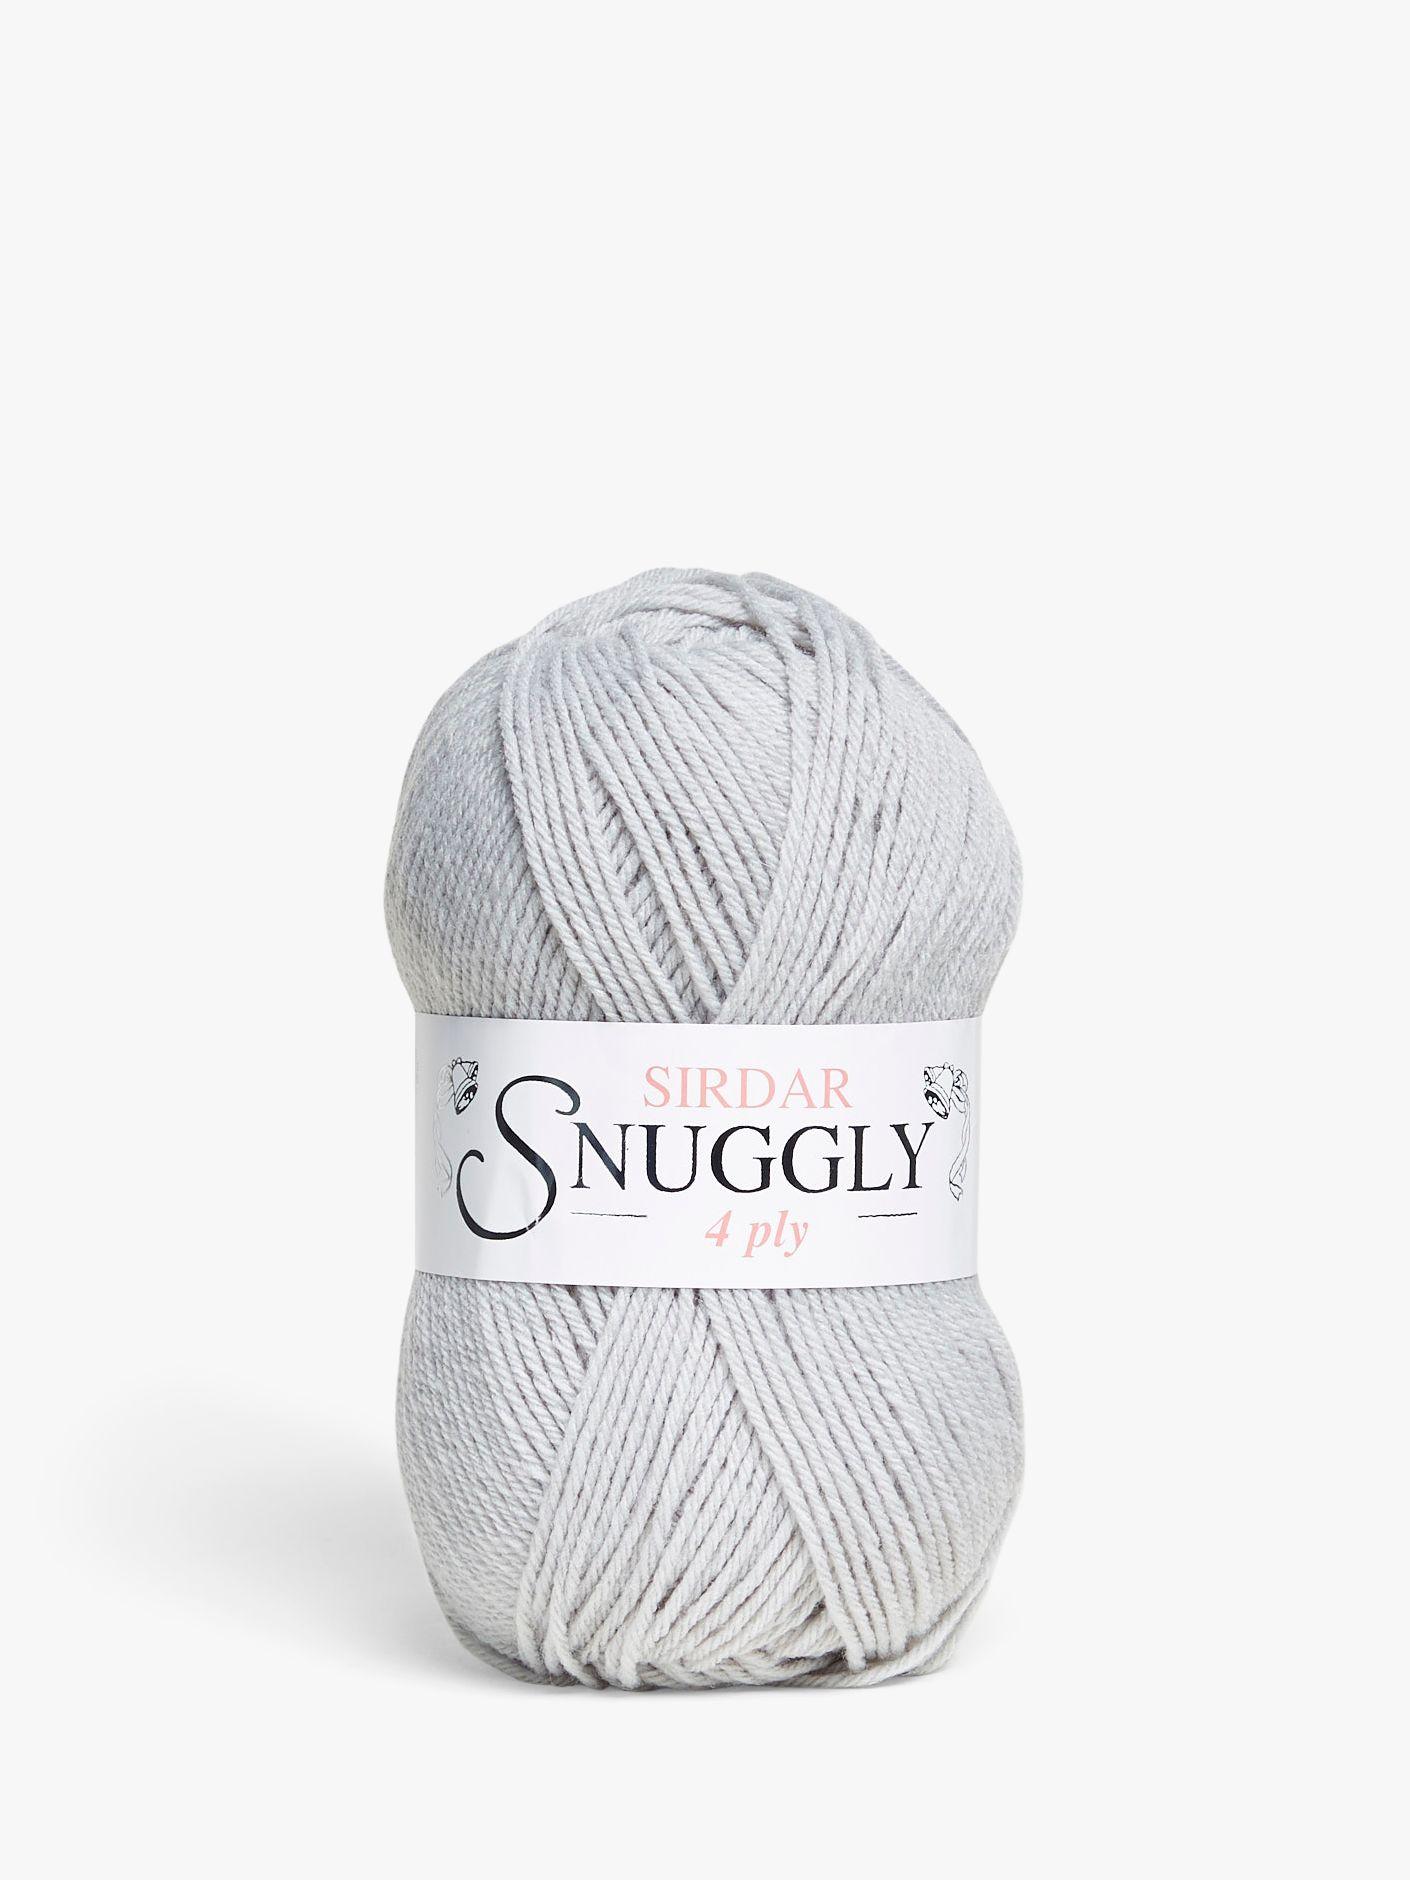 Sirdar Sirdar Snuggly 4 Ply Yarn, 50g